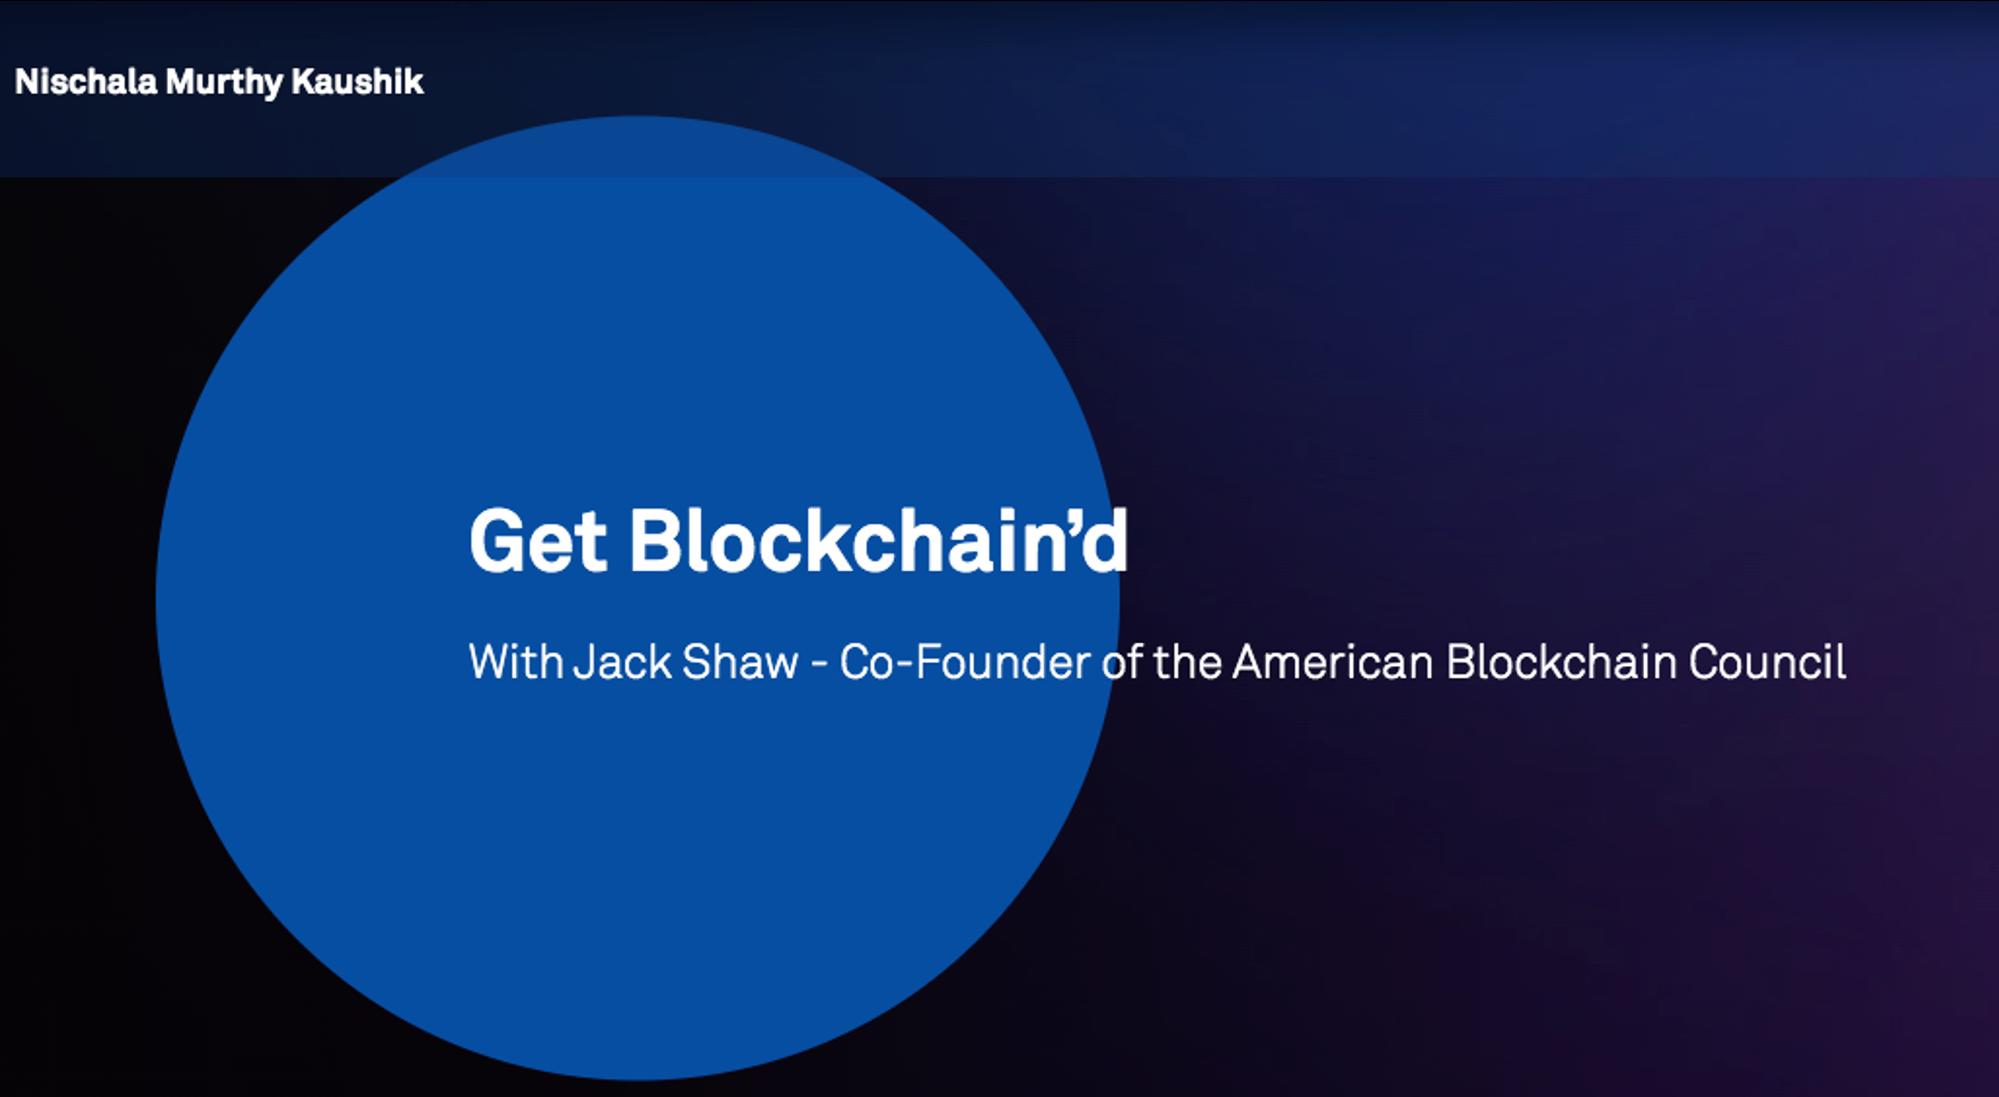 Get Blockchain'd